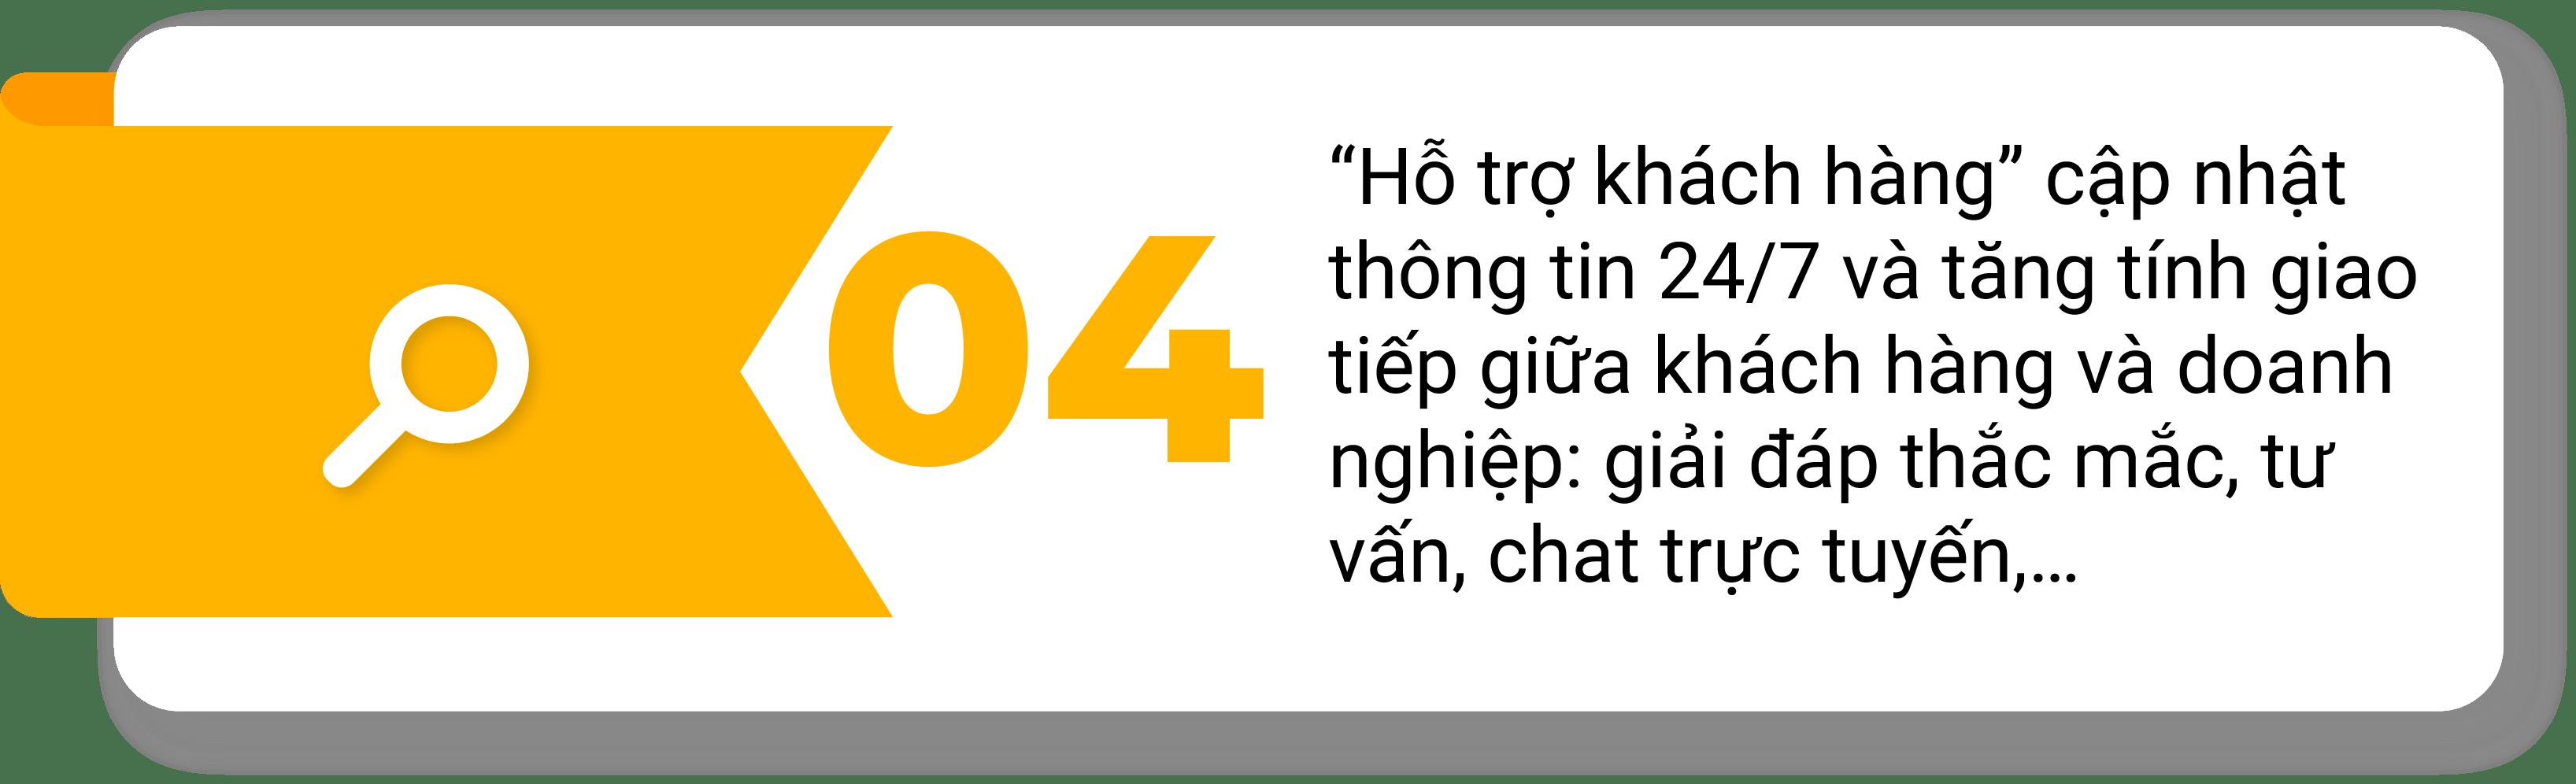 ho-tro-khach-hang-min